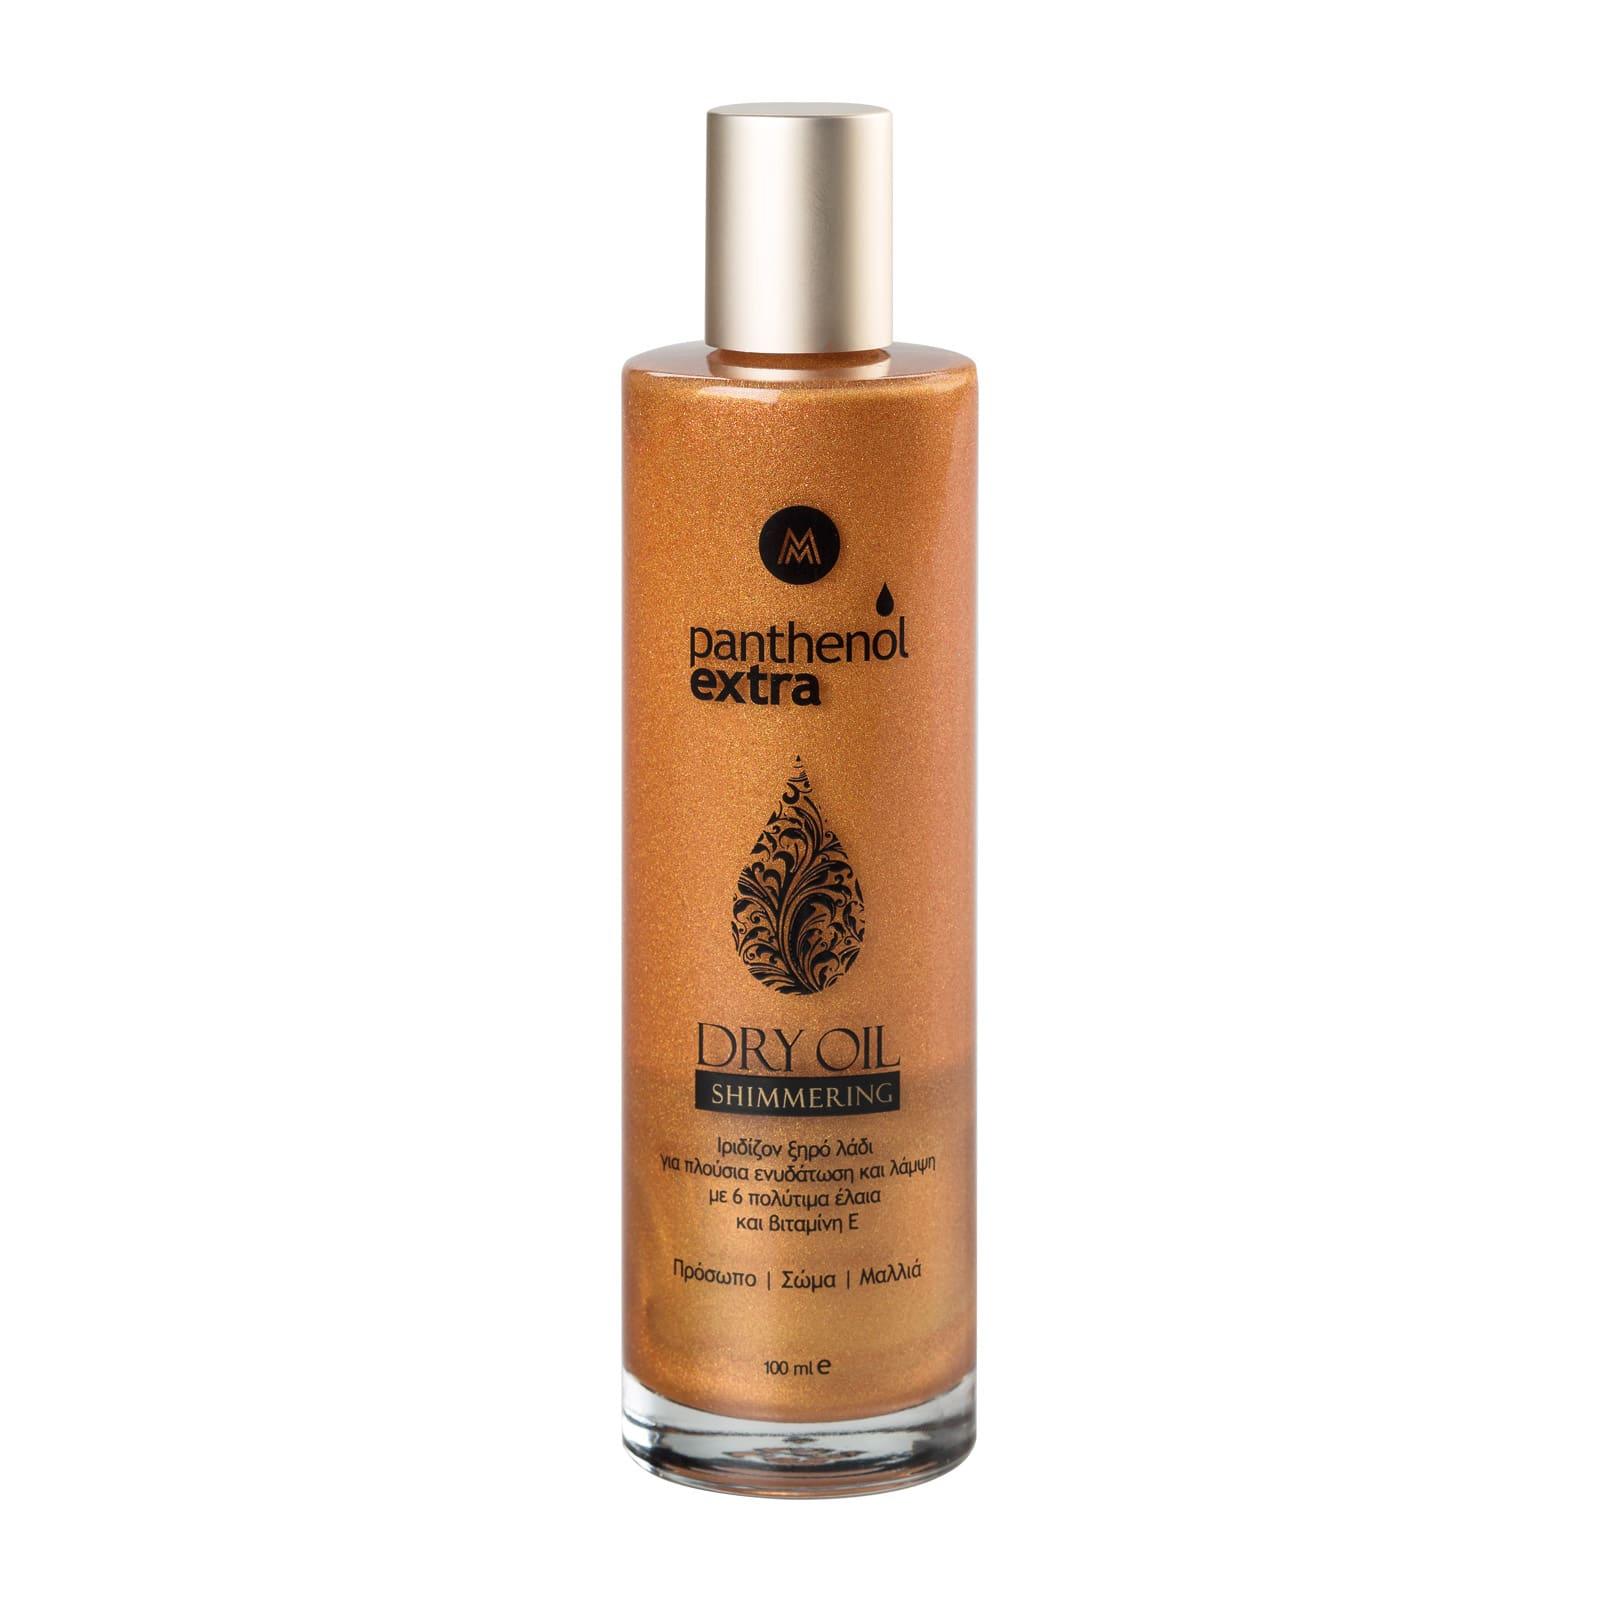 Panthenol Extra Shimmering Dry Oil Ιριδίζον Ξηρό Λάδι για πλούσια ενυδάτωση & λάμψη σε πρόσωπο σώμα & μαλλιά, 100ml